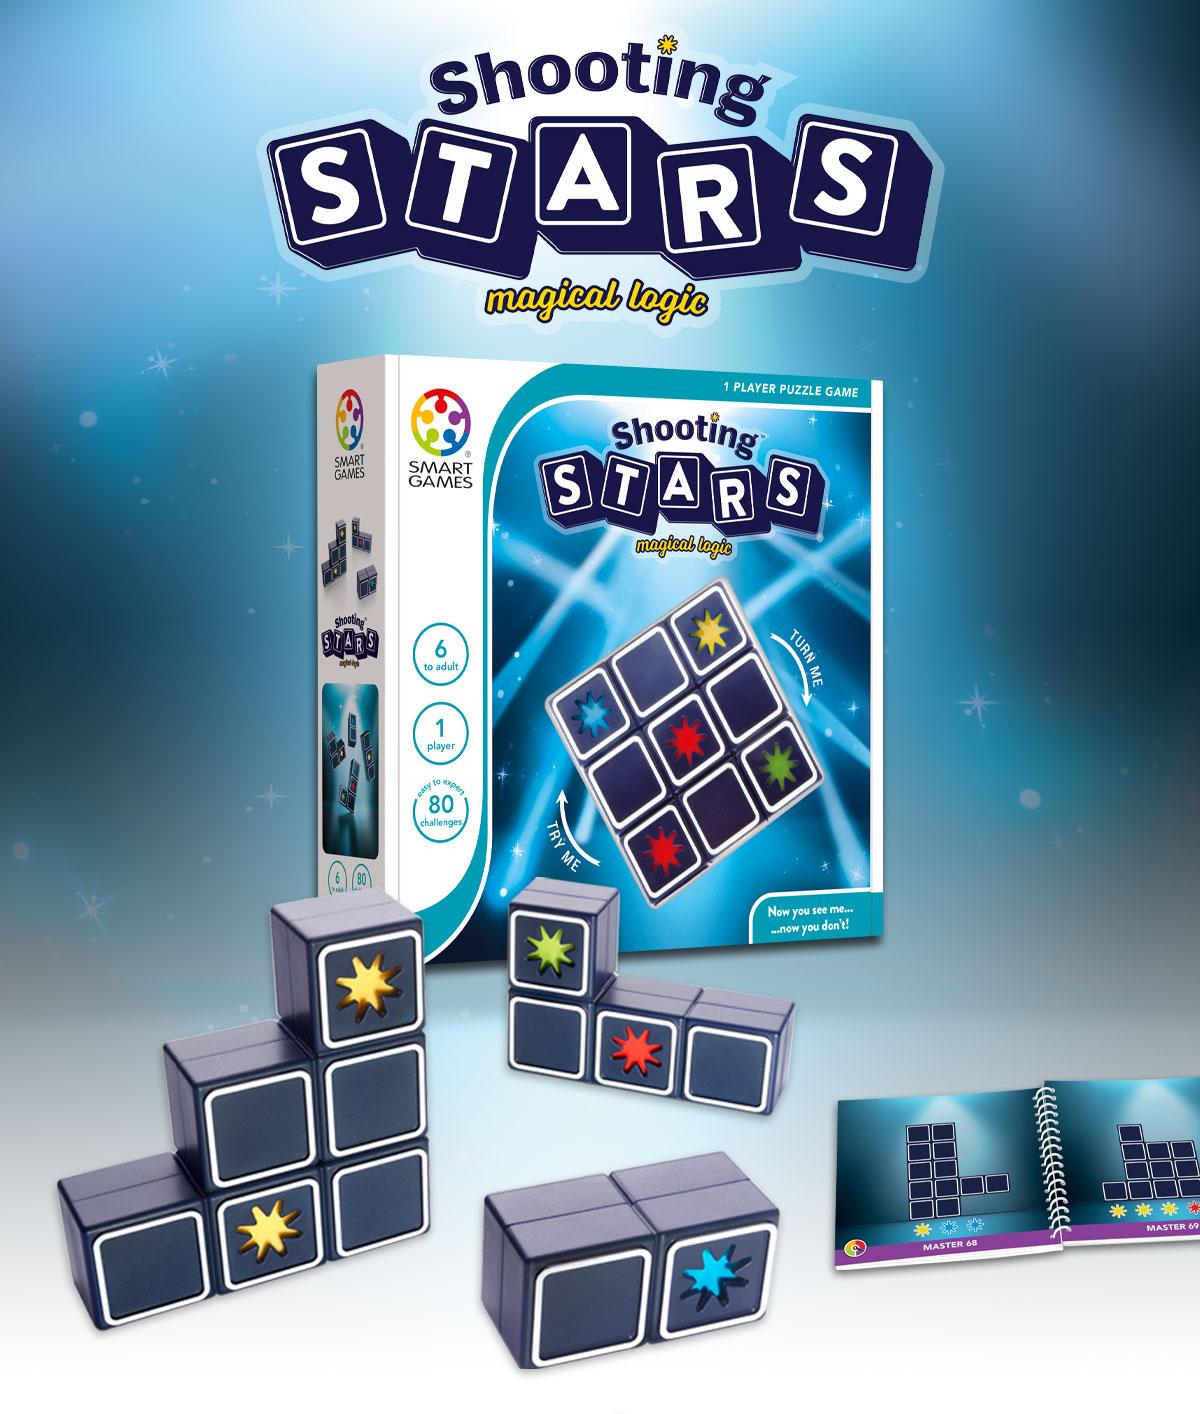 _shootingstars-